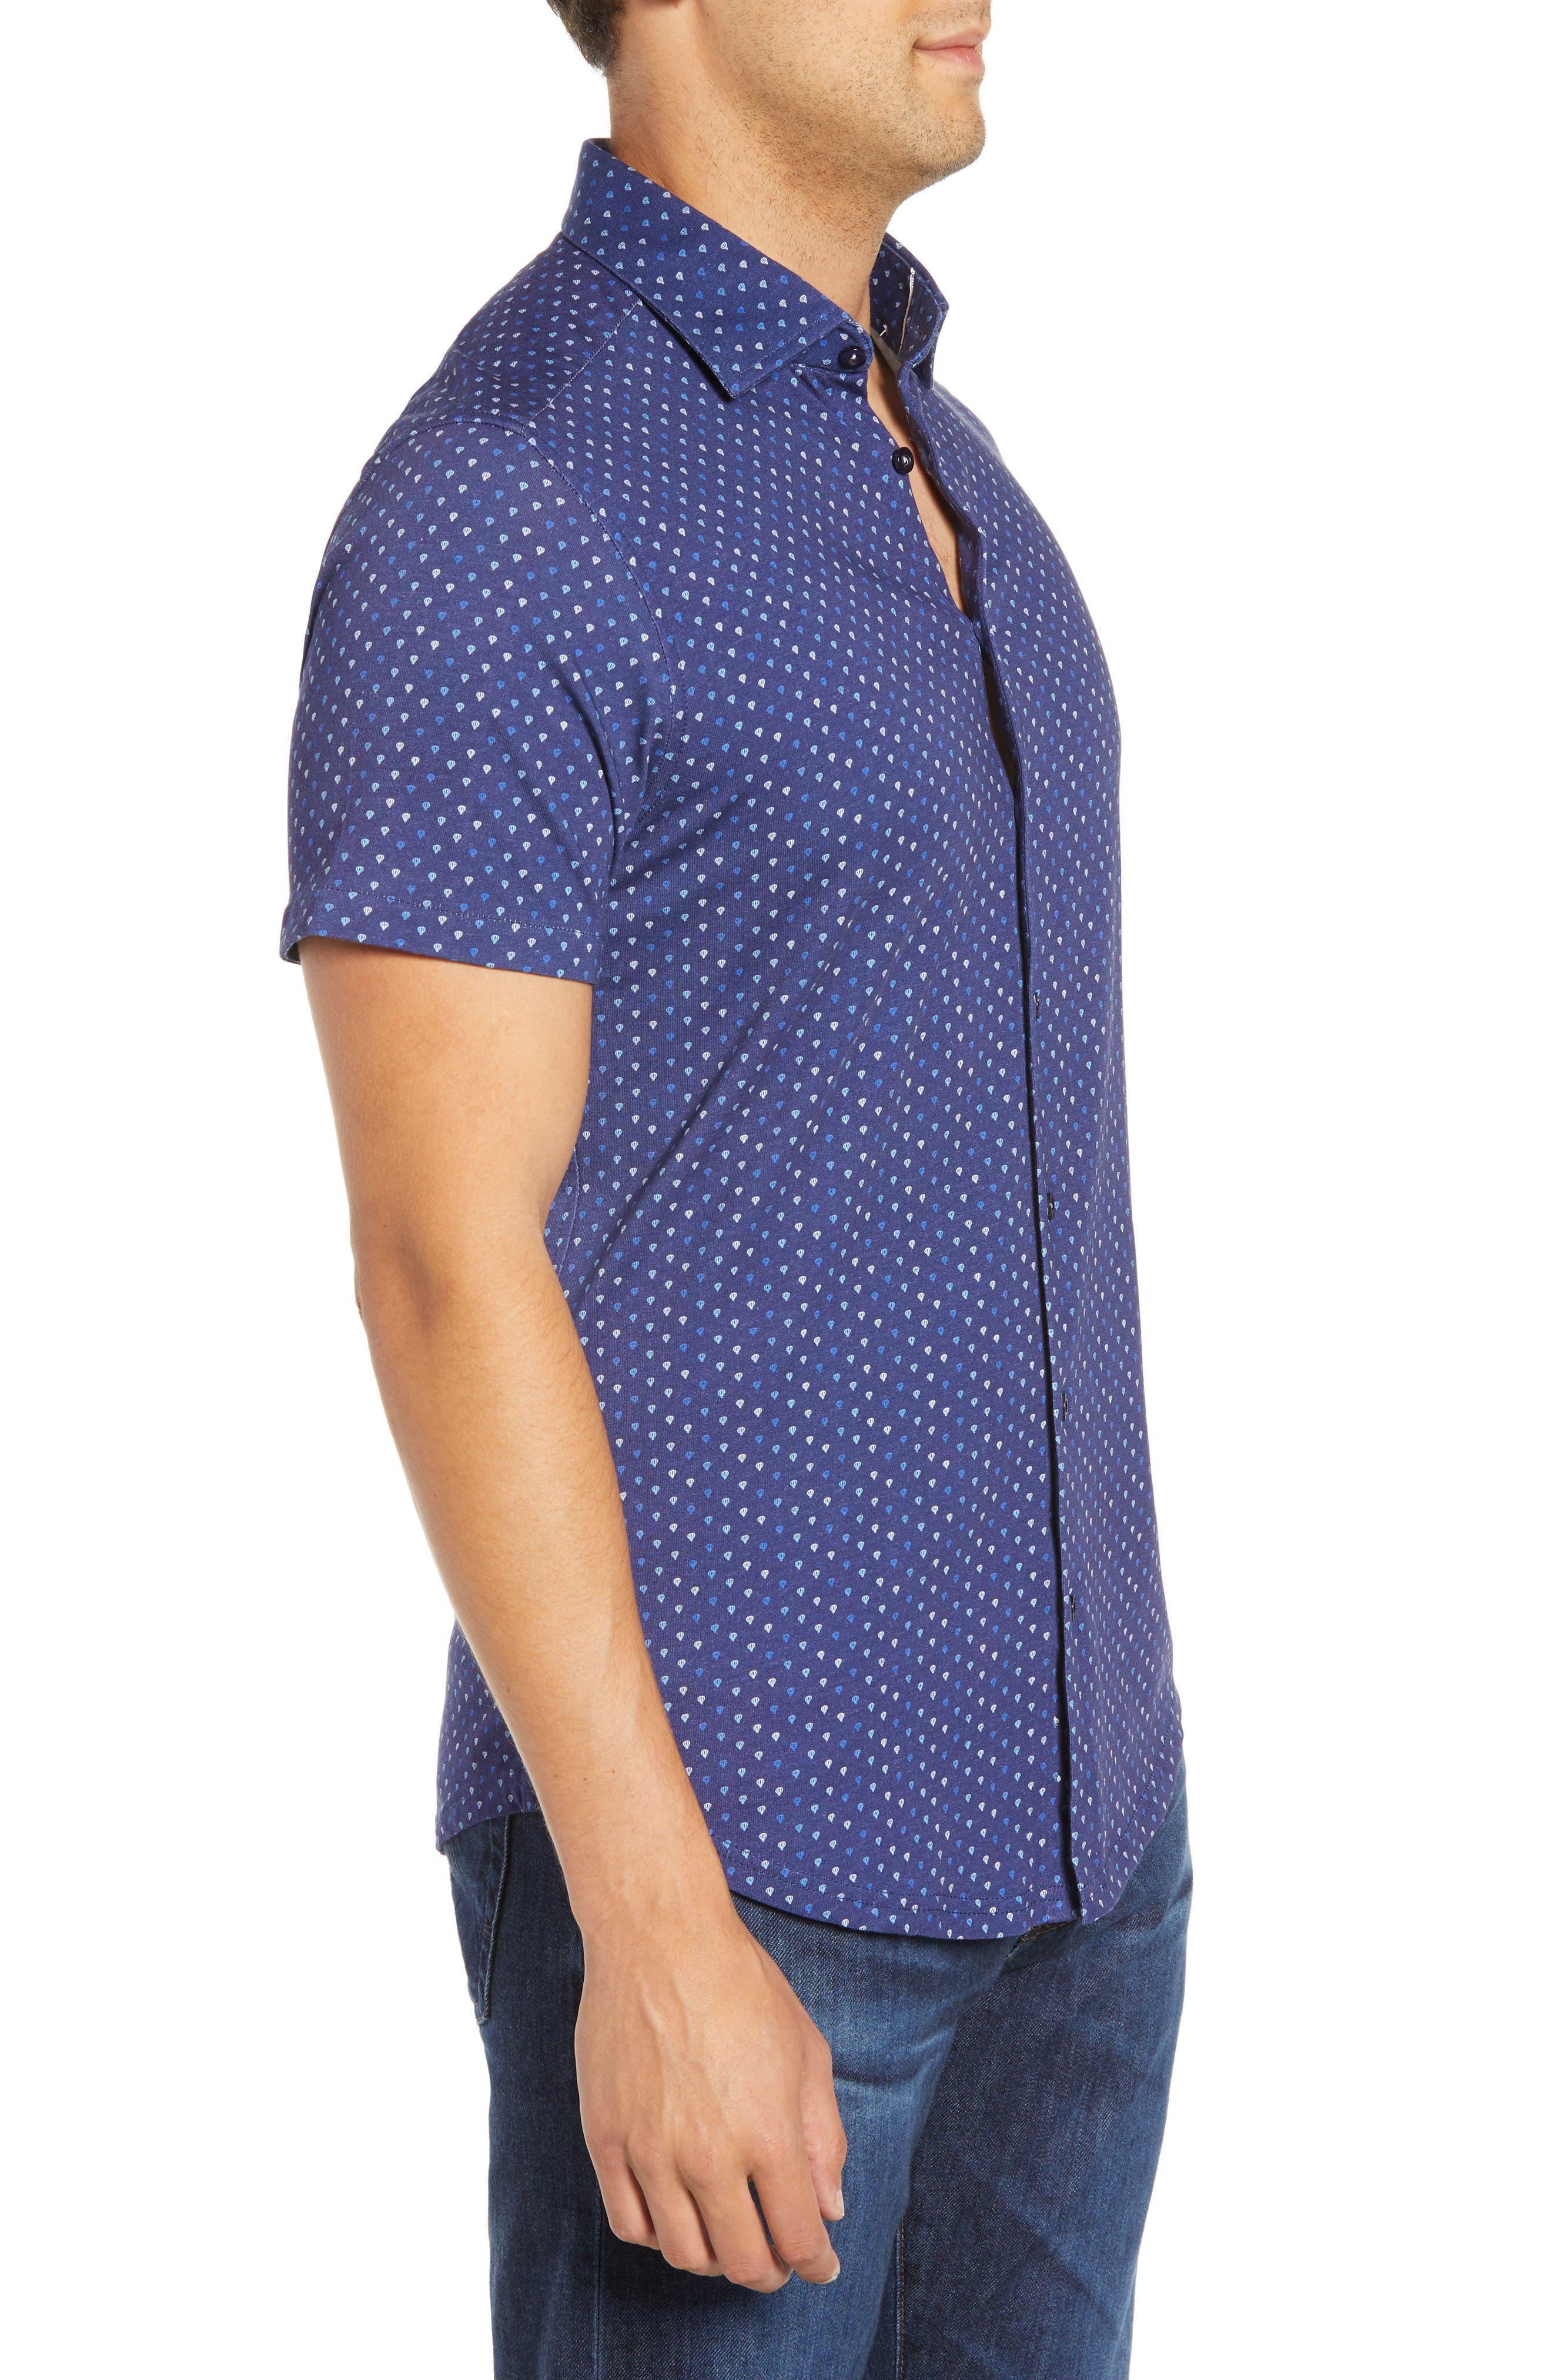 Regular Fit Sport Shirt,                             Alternate thumbnail 4, color,                             NAVY